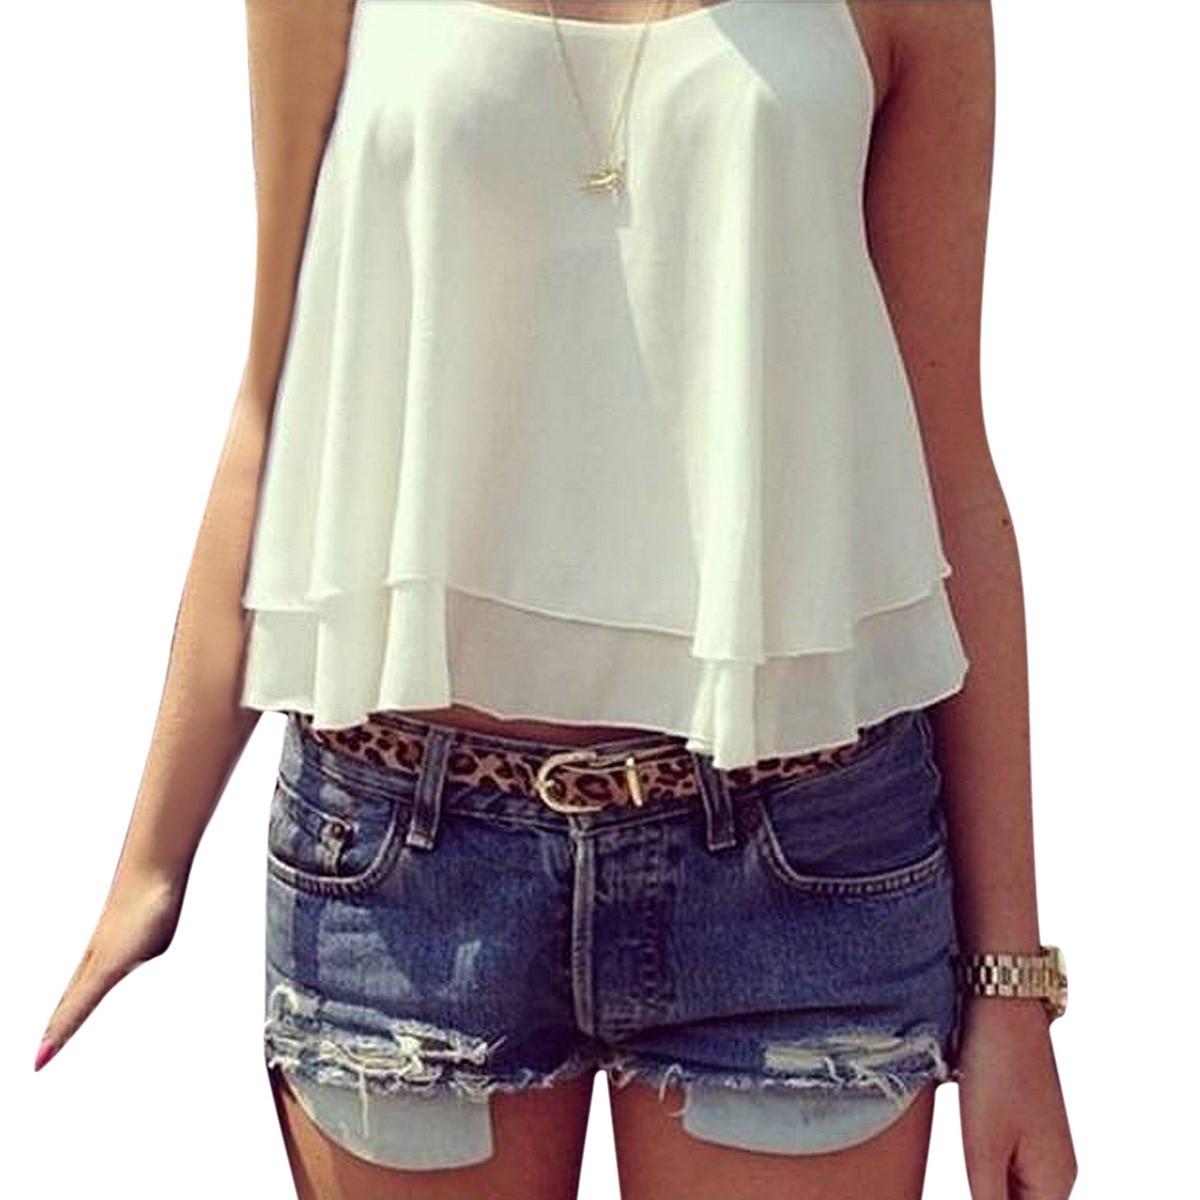 Zanzea Summer Style Tank Tops 2018 Sexy Womens Chiffon Double Layer Sleeveless Casual Solid Crop Top Cami T-Shirt Plus Size 4XL